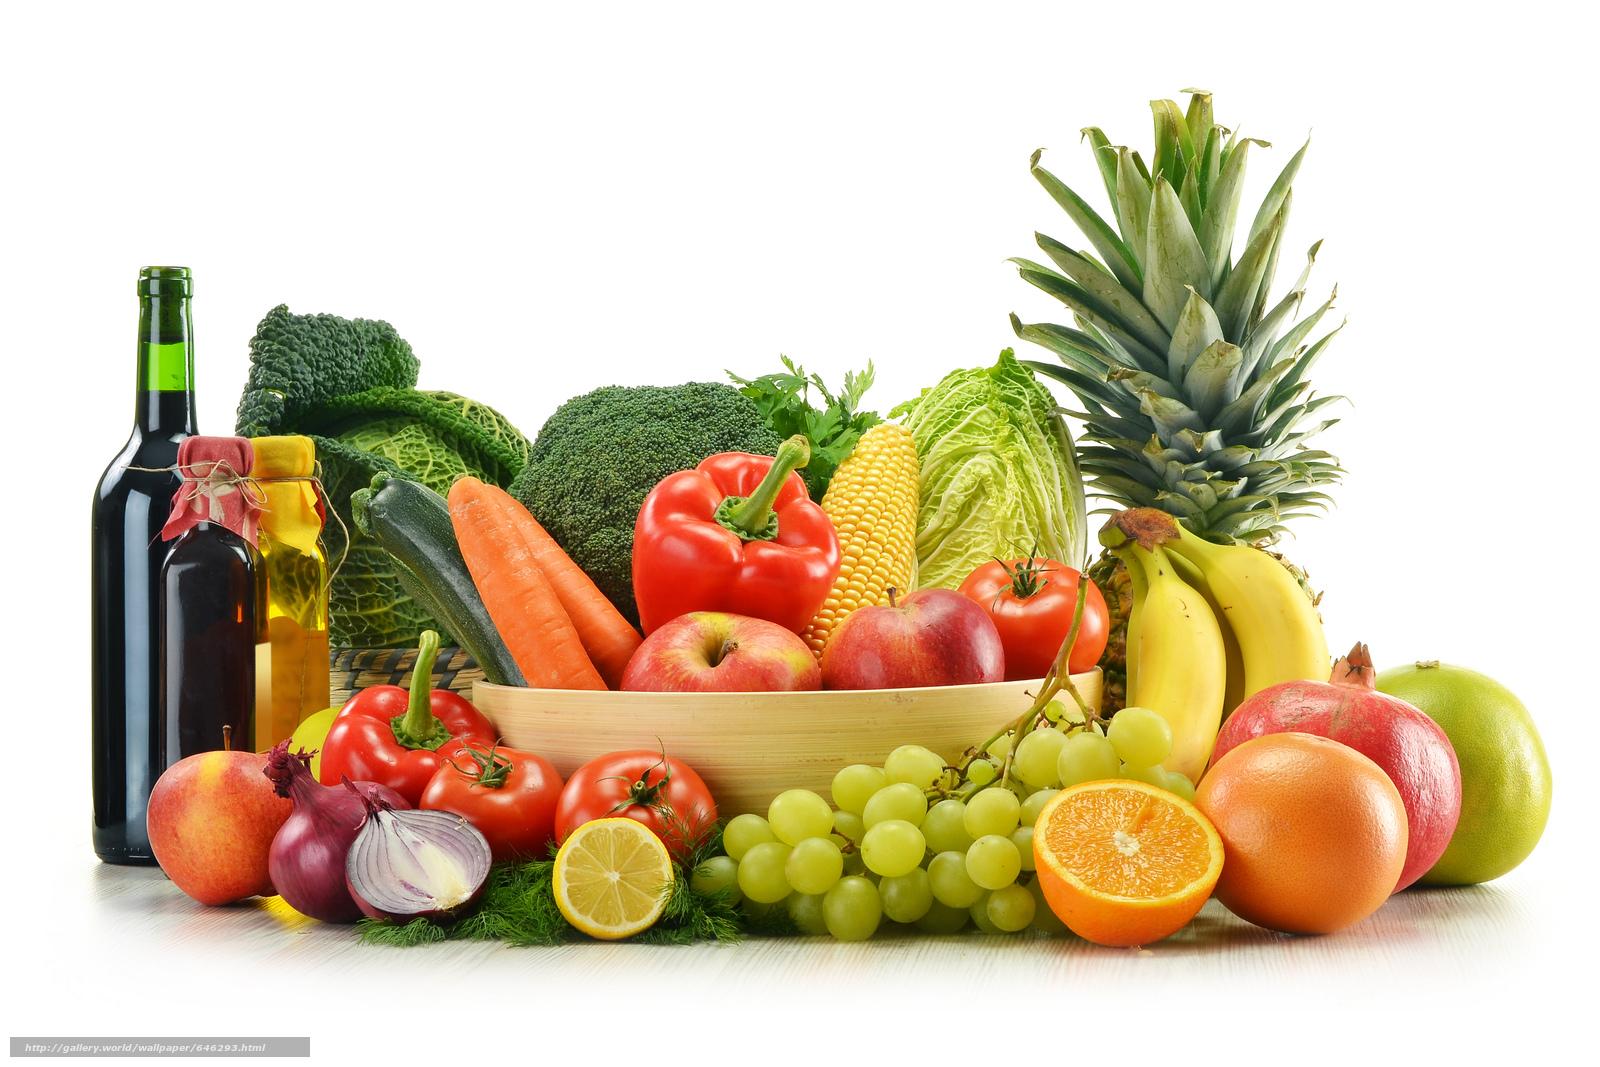 Download wallpaper vegetables,  fruit,  food free desktop wallpaper in the resolution 9216x6144 — picture №646293